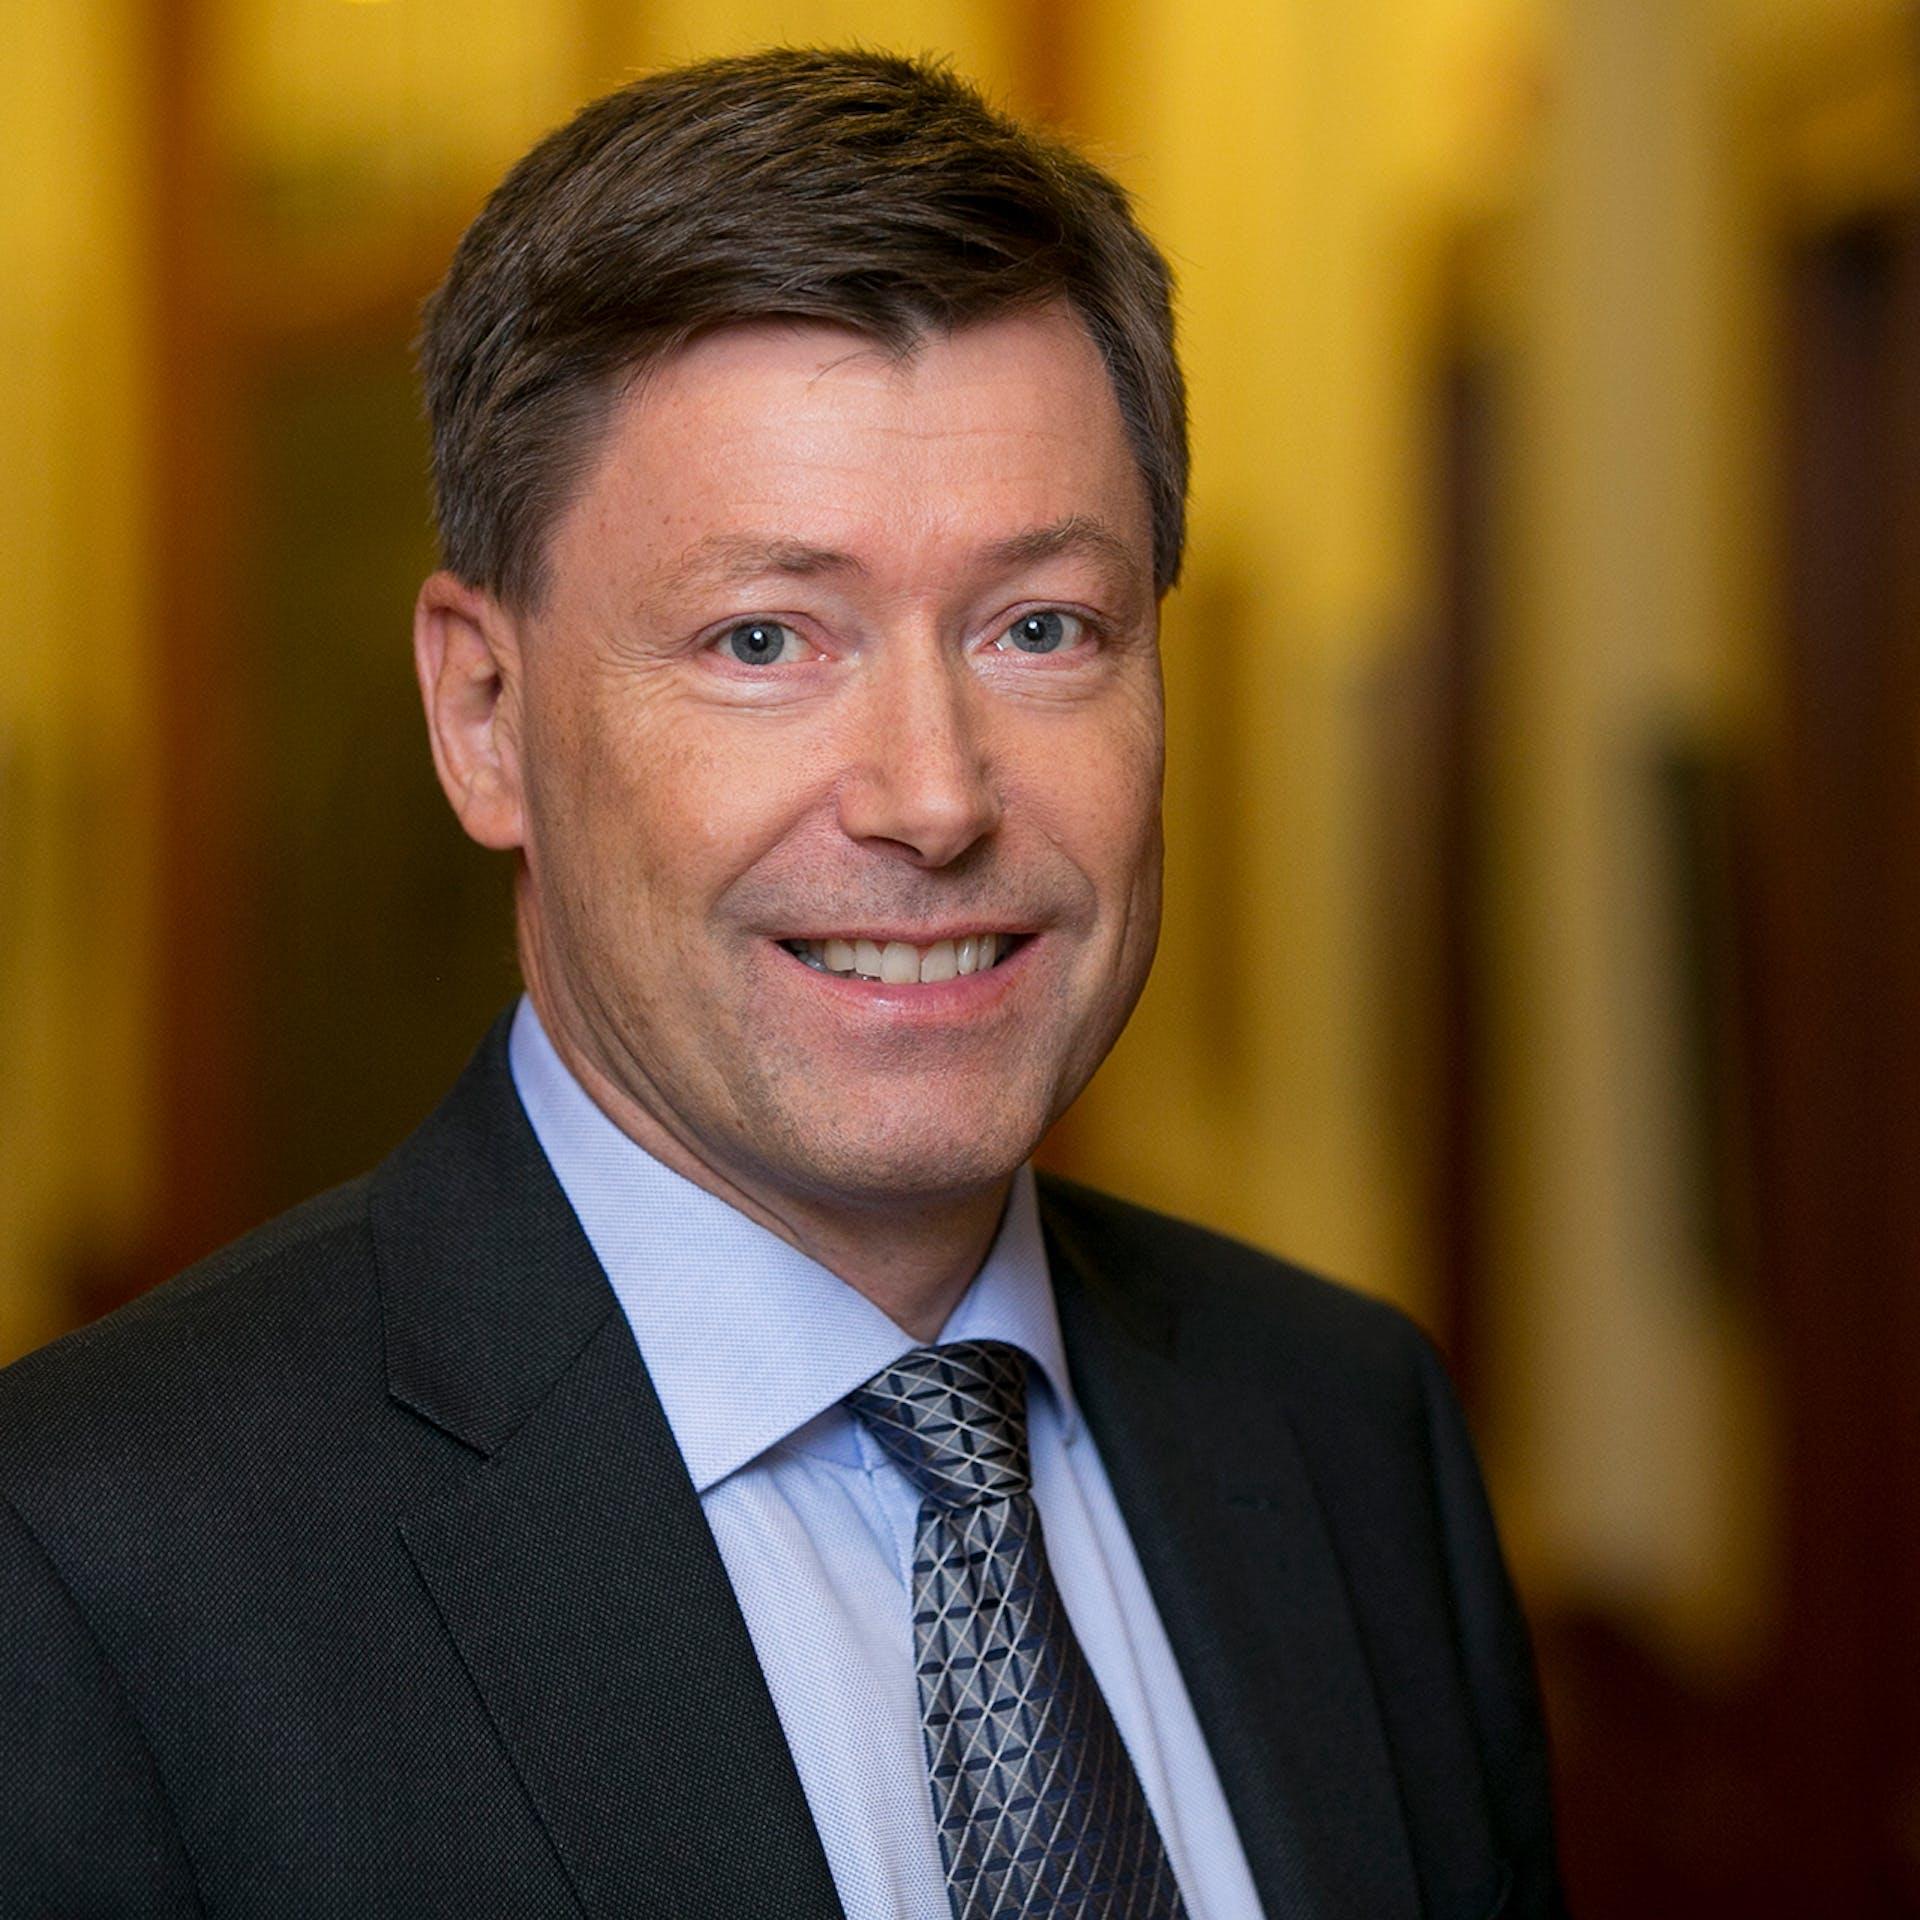 Einar Þór Bjarnason